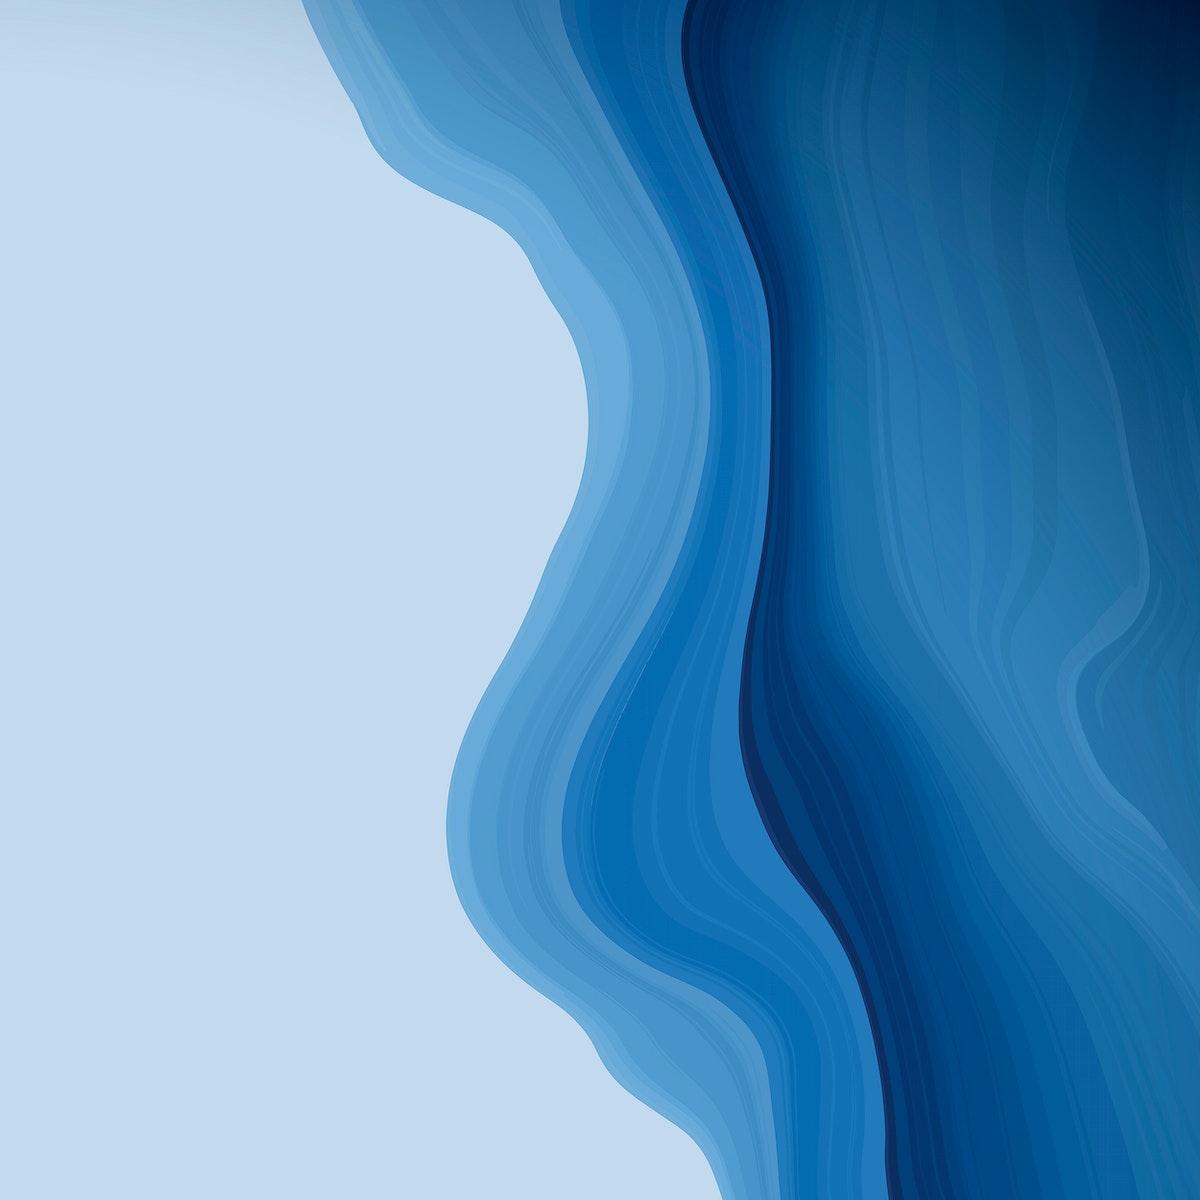 Blue fluid patterned background vector